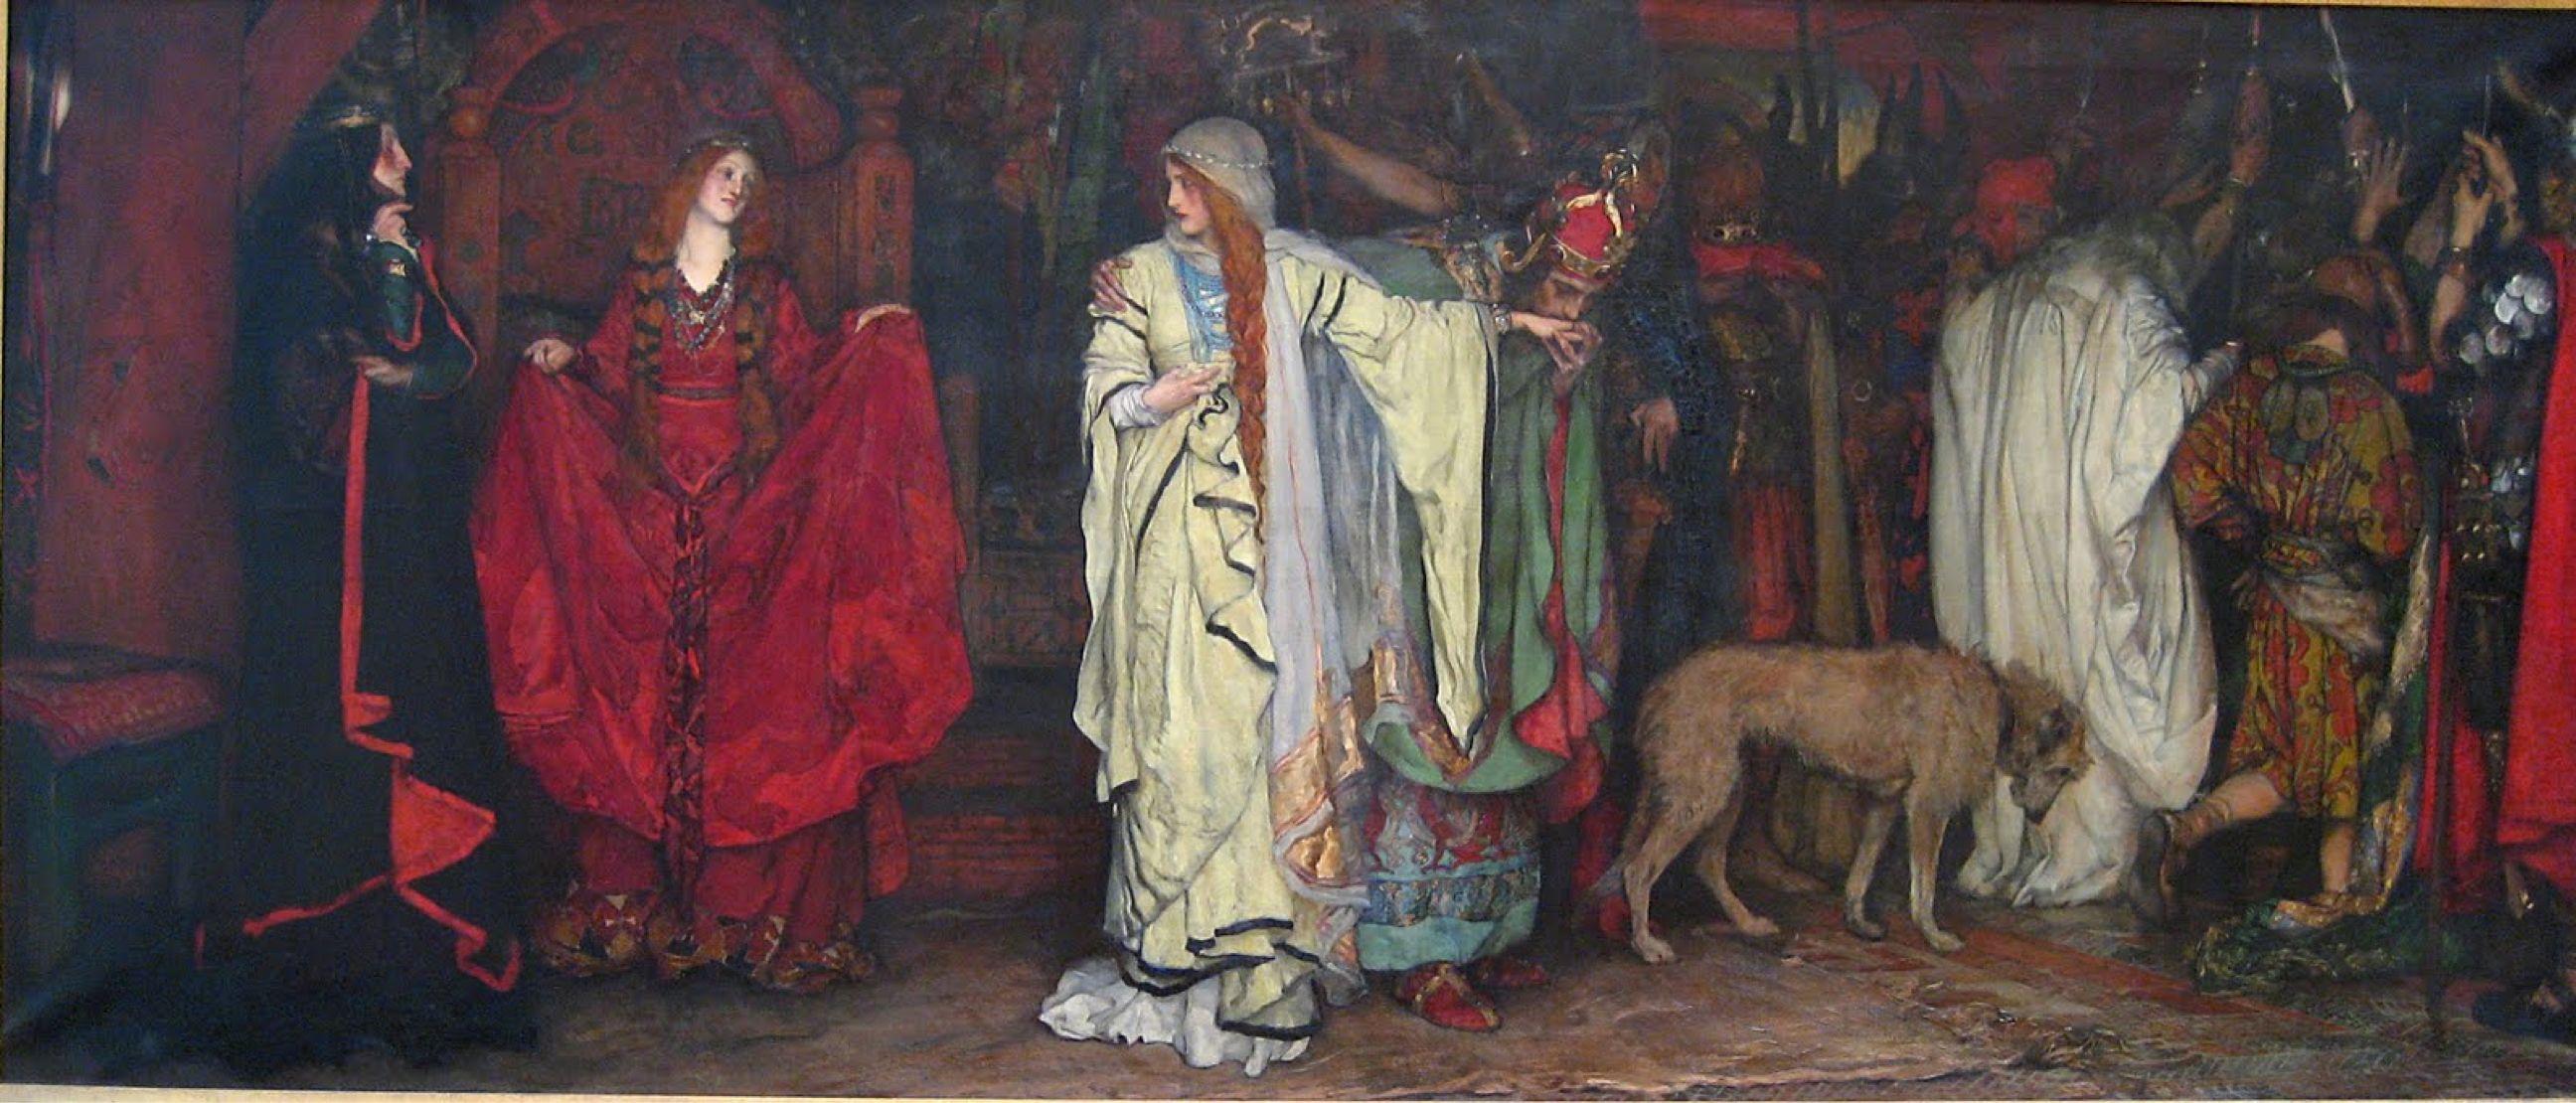 Edwin austin abbey sketch metropolitan museum of art